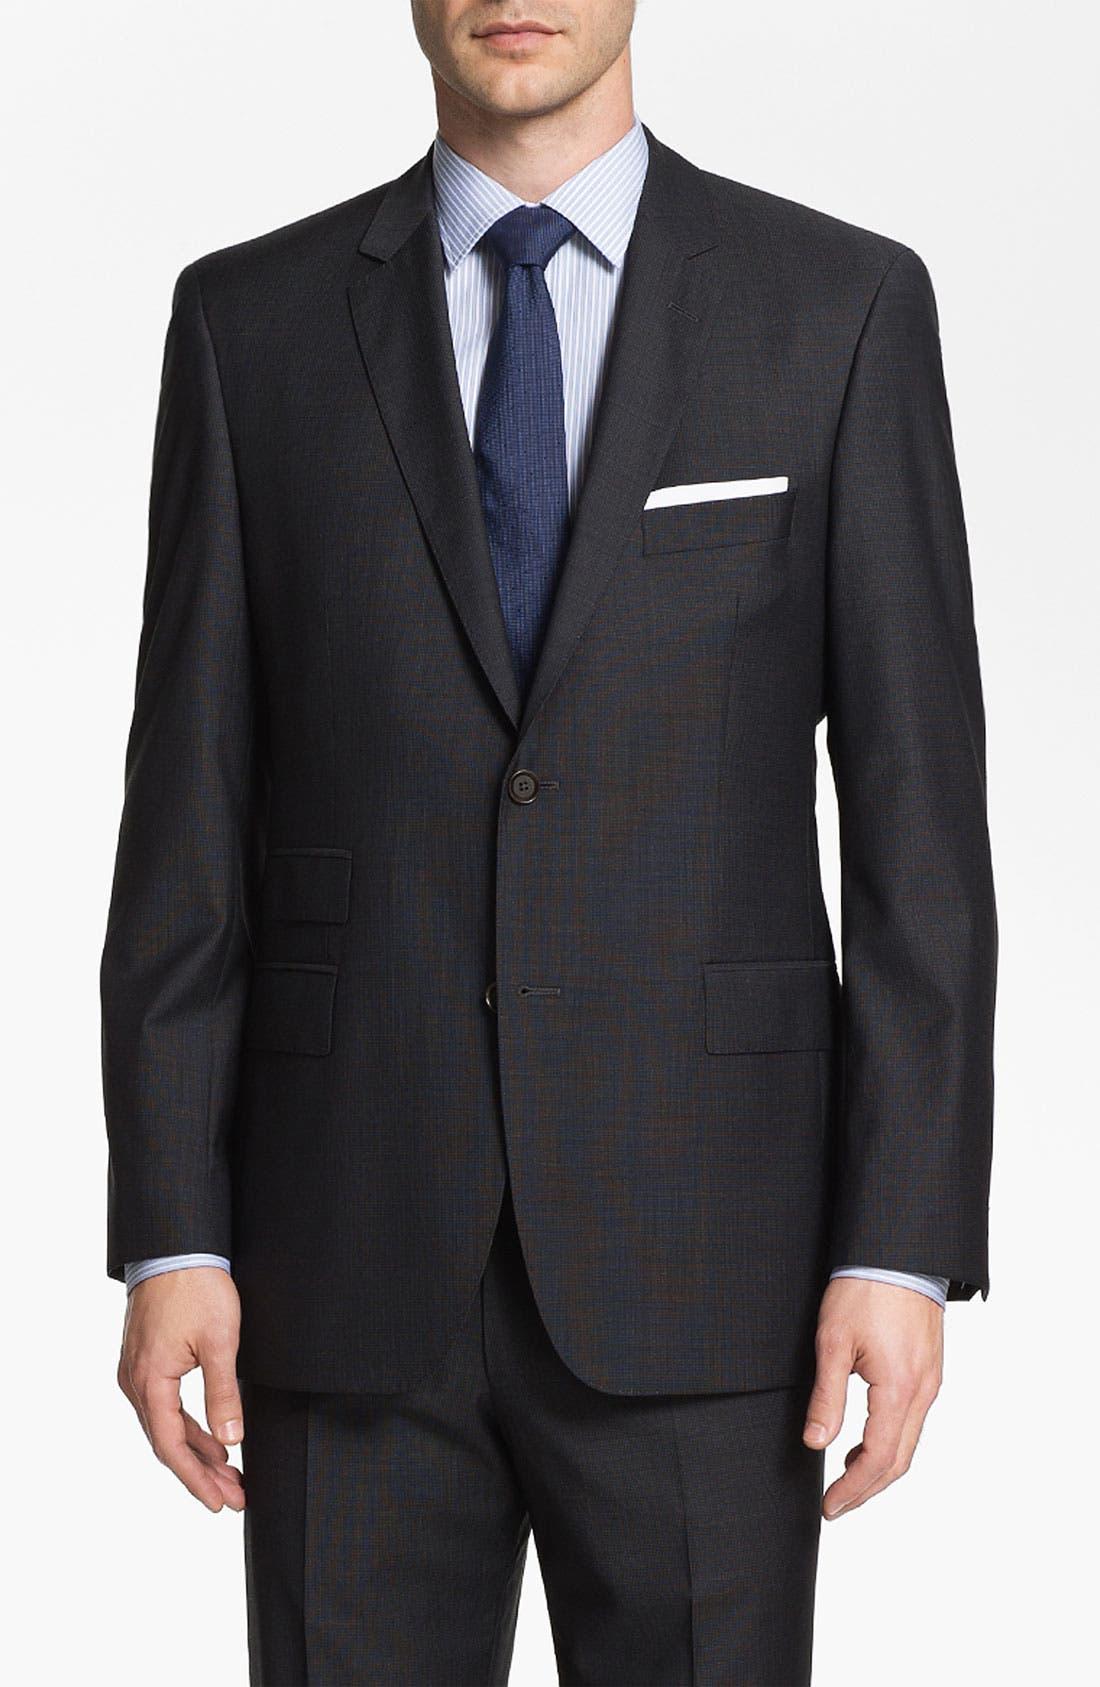 Alternate Image 1 Selected - BOSS Black 'Edison/Power' Wool Suit